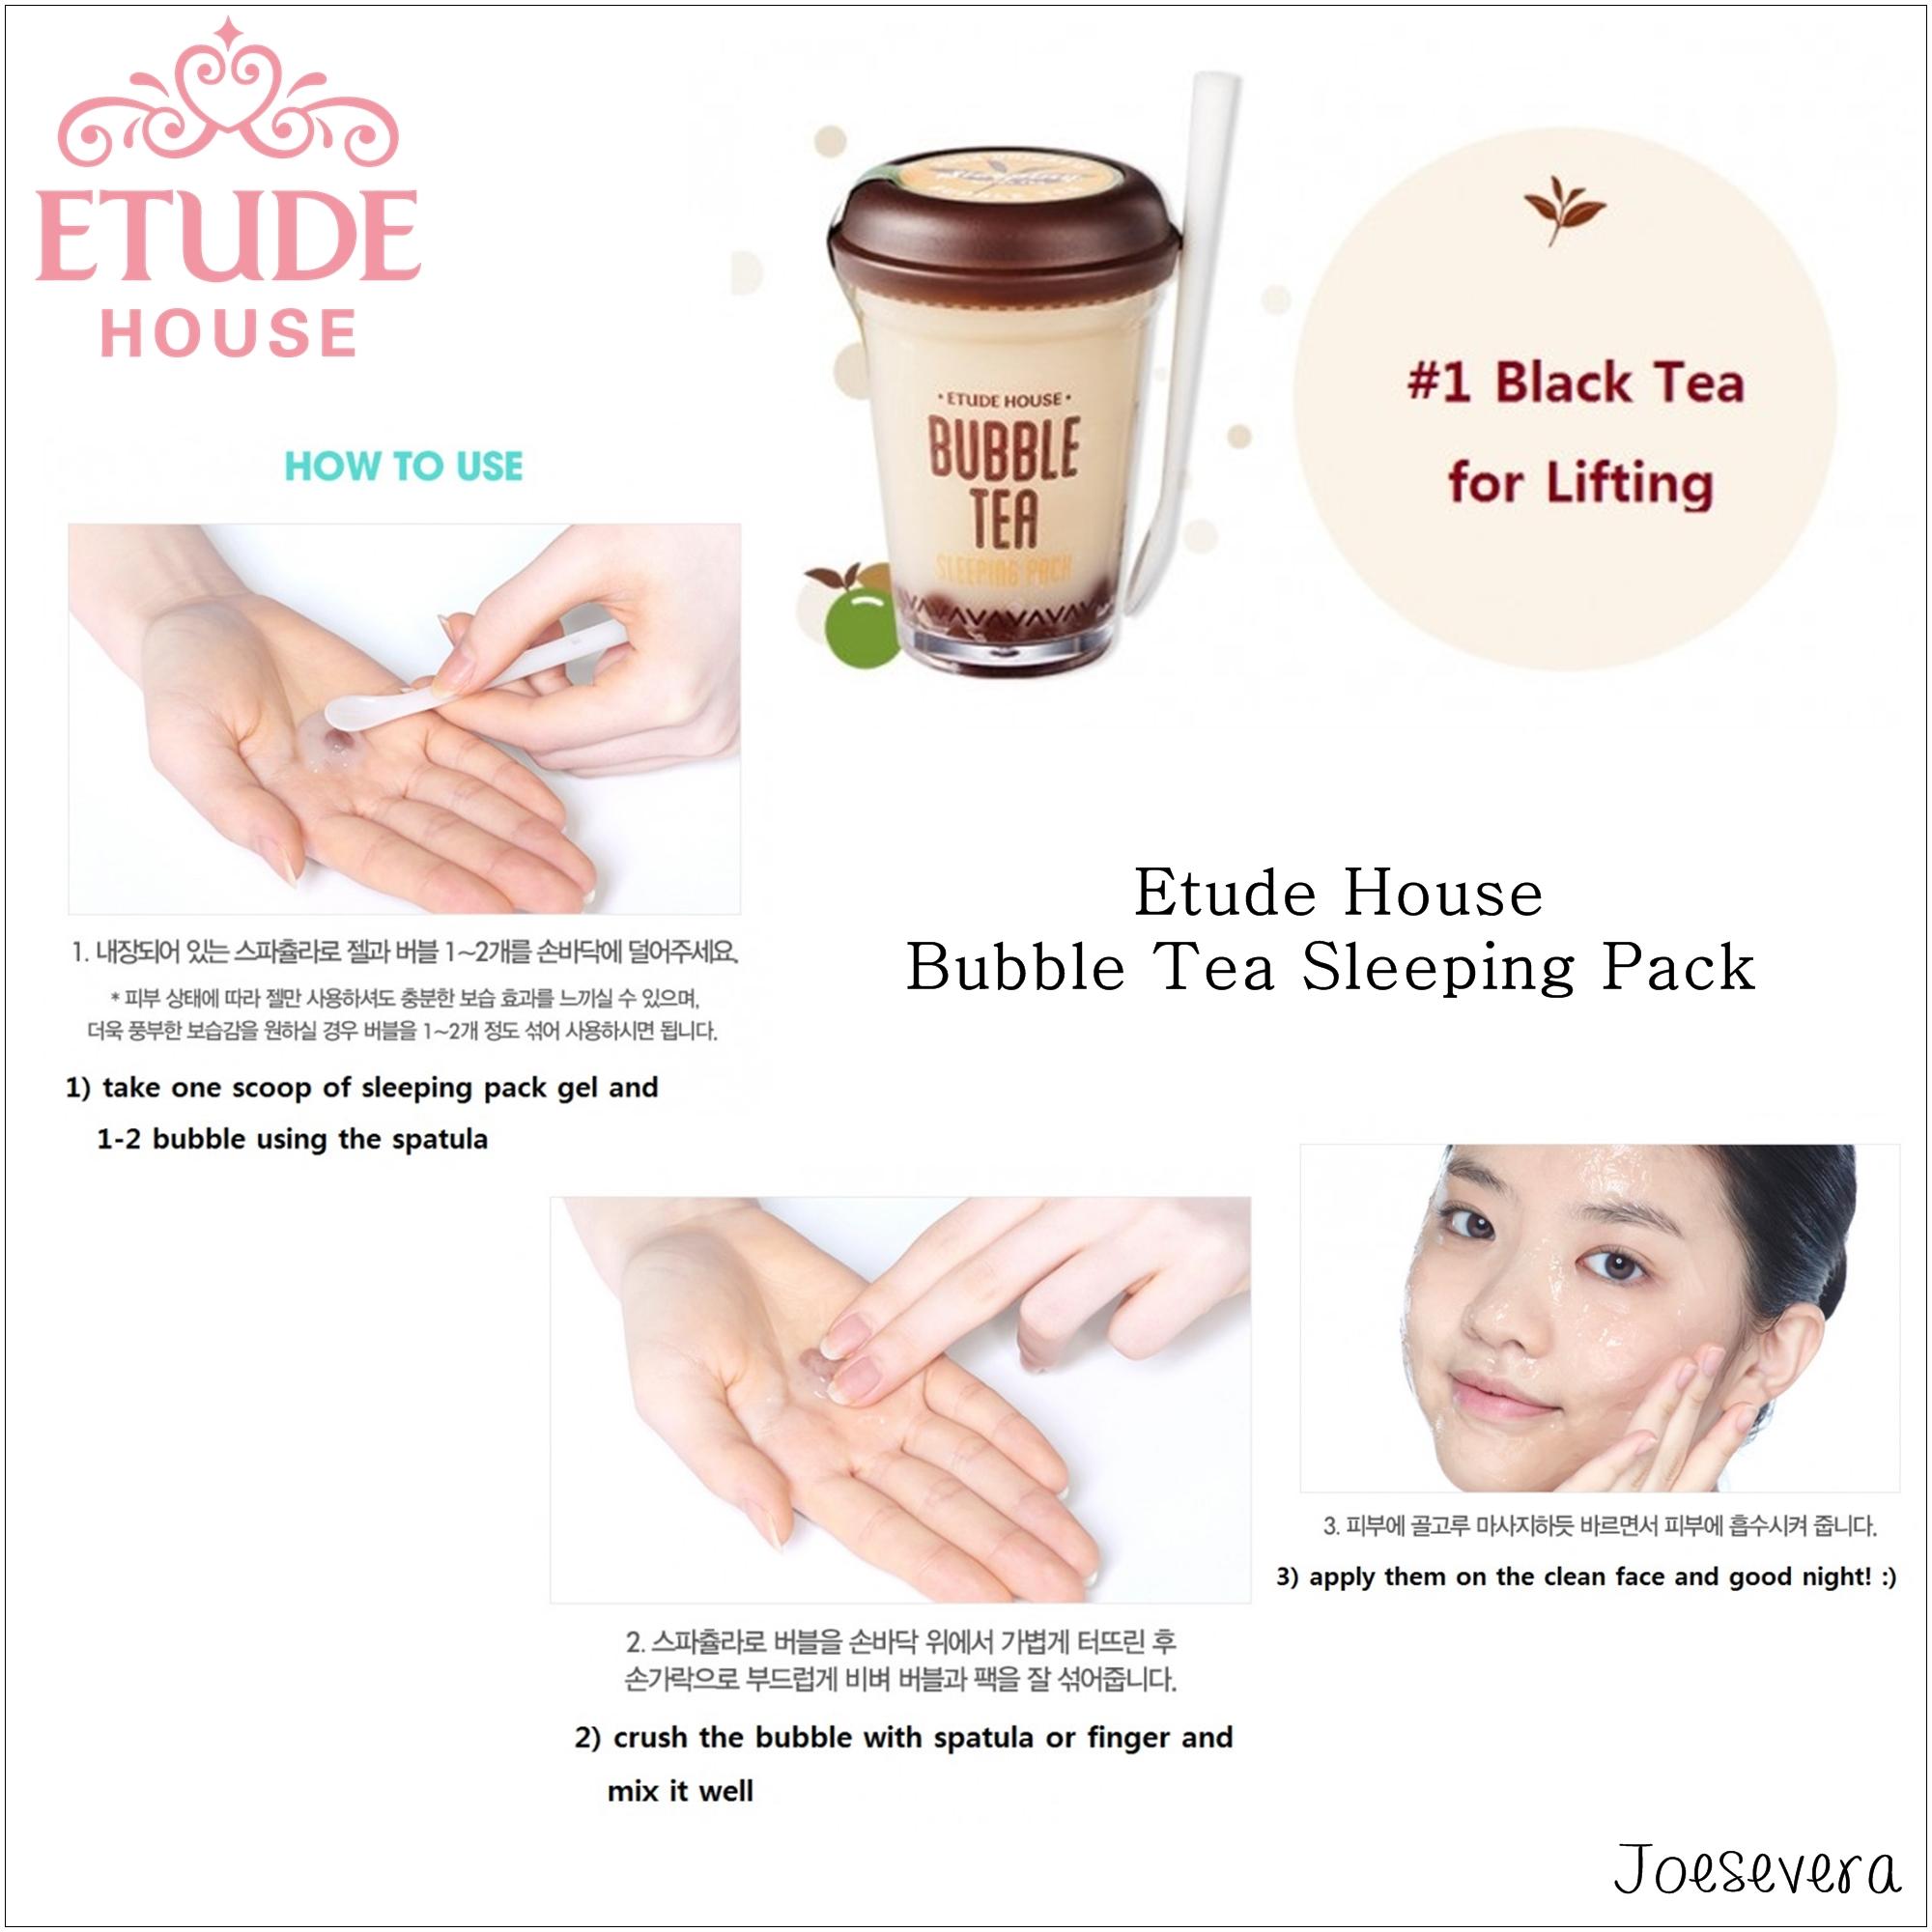 ... Face Mask Masker Wajah Black Source · Jual Etude House Bubble Tea Sleeping Pack Black